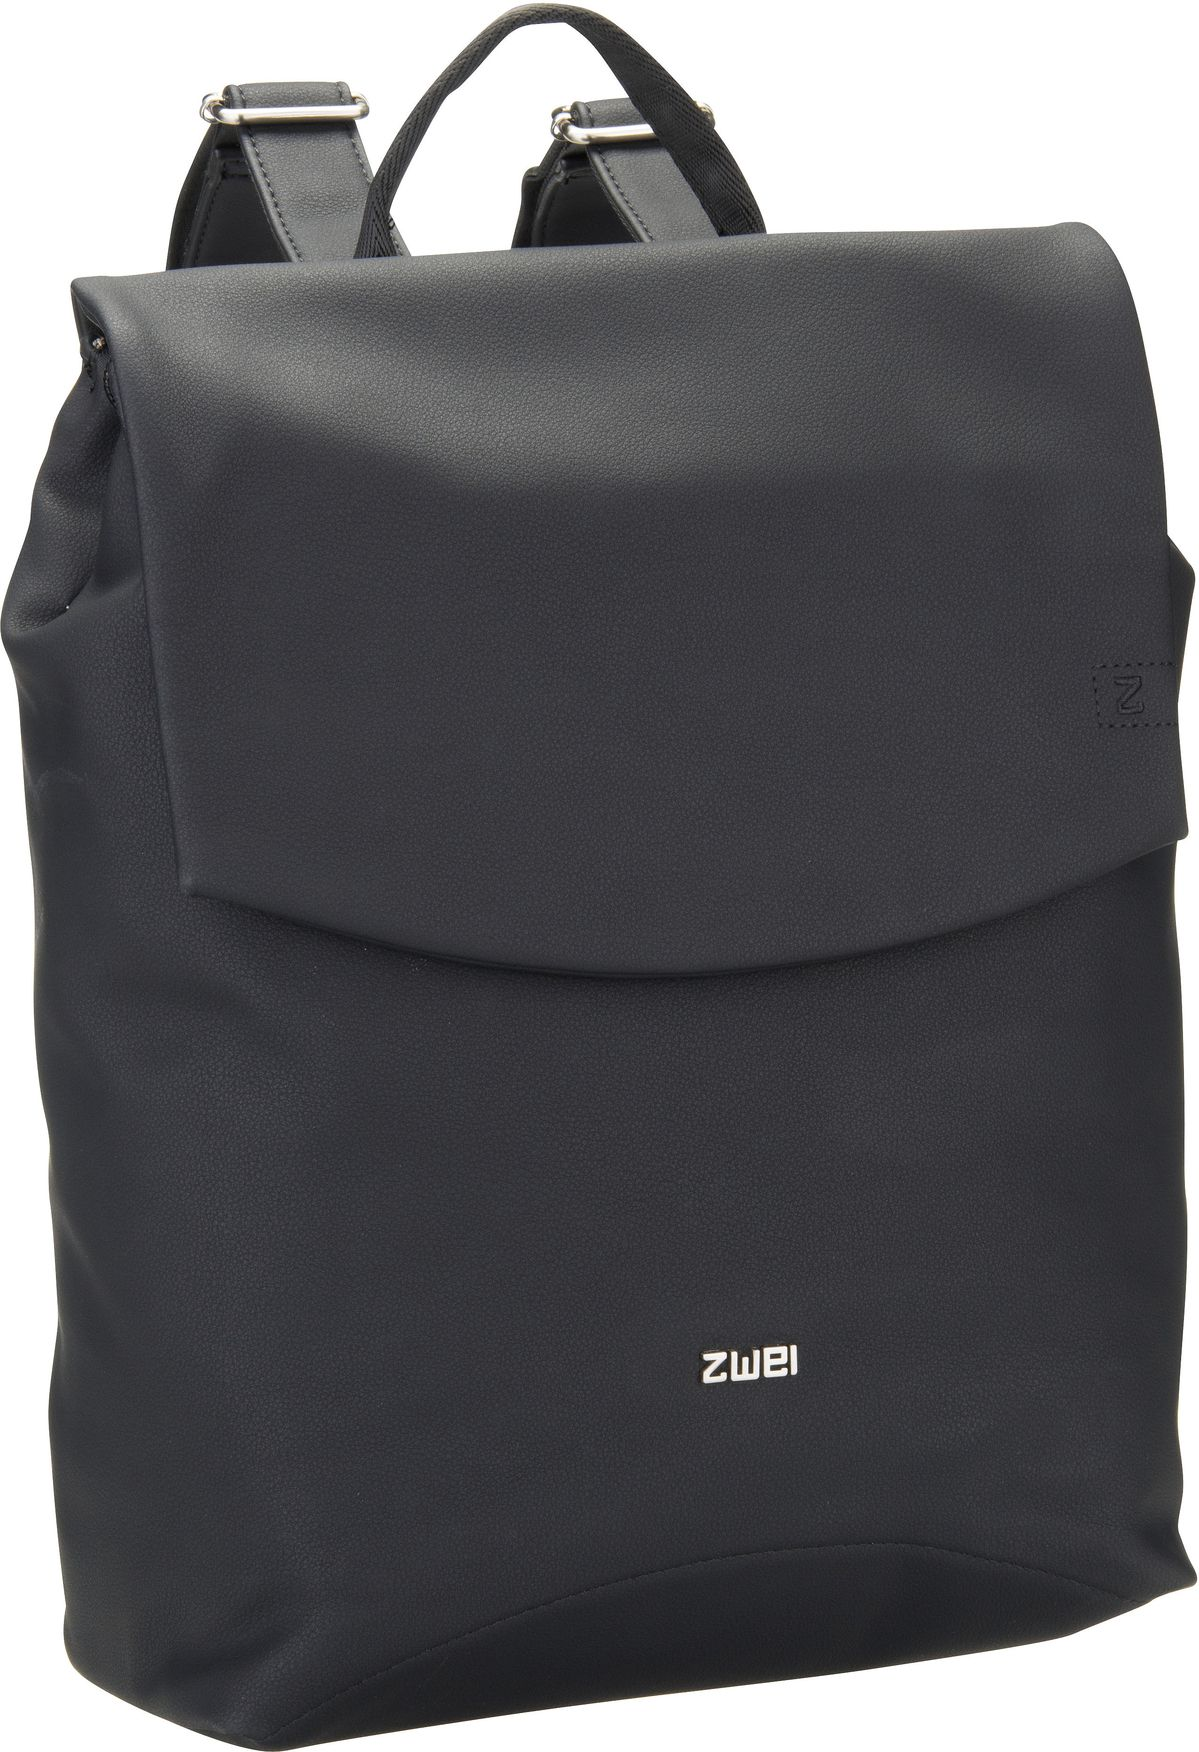 Rucksack / Daypack Elli ELR13 Black (8 Liter)